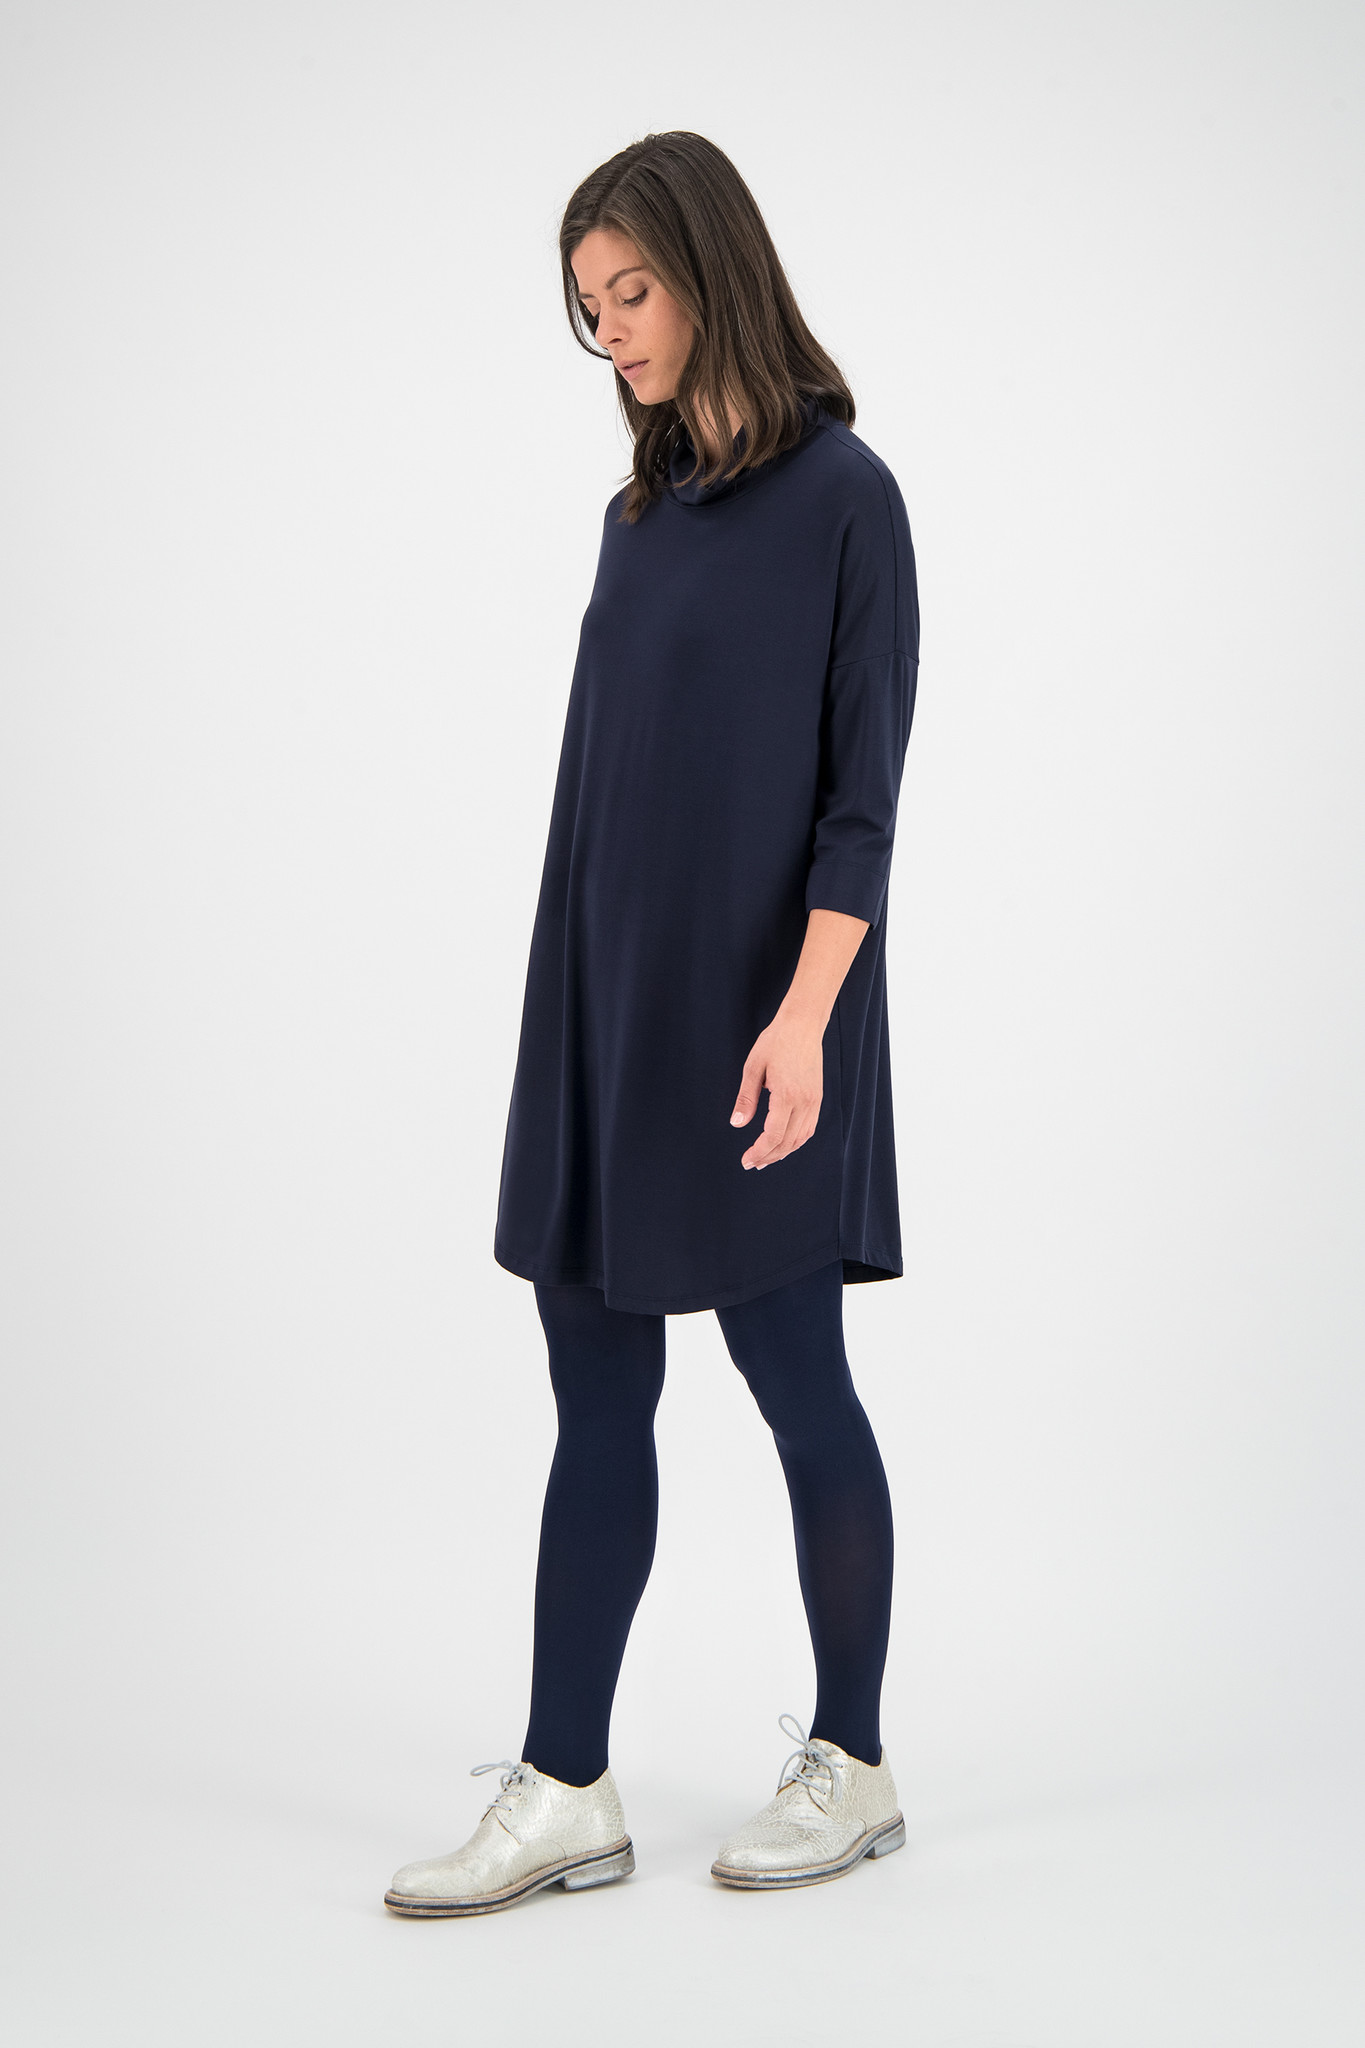 SYLVER New Lyocell Shirt - Dark Blue